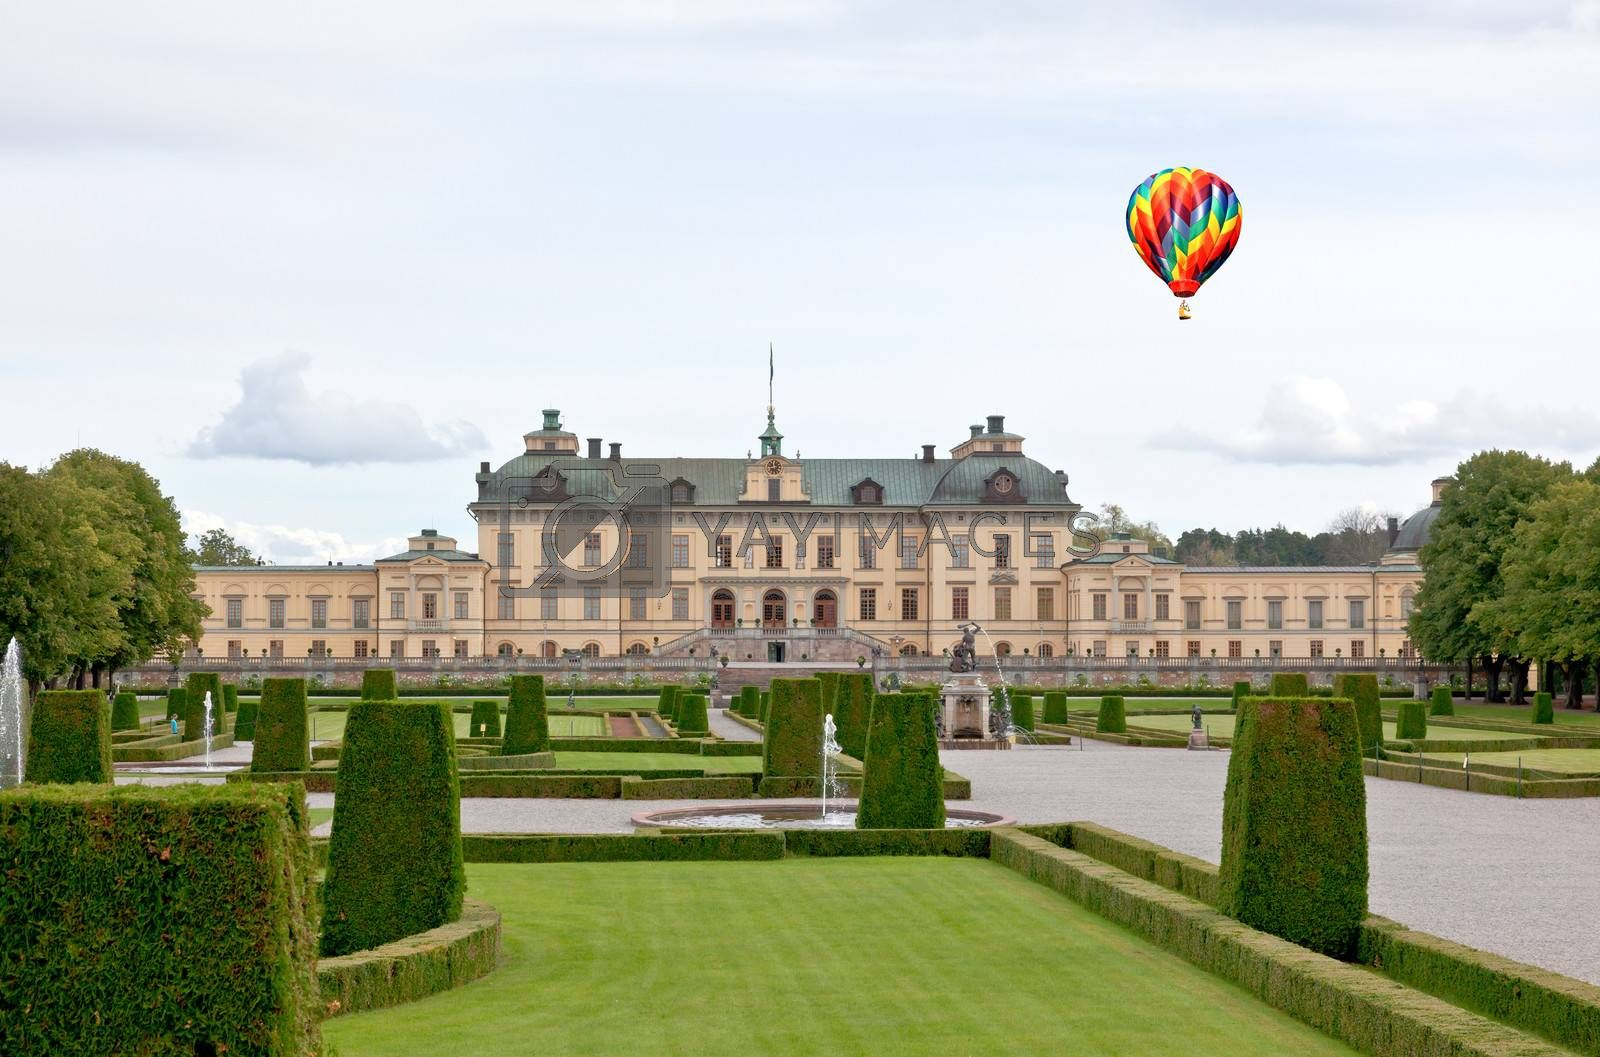 Drottningholms Palace in the Stockholm city, Sweden